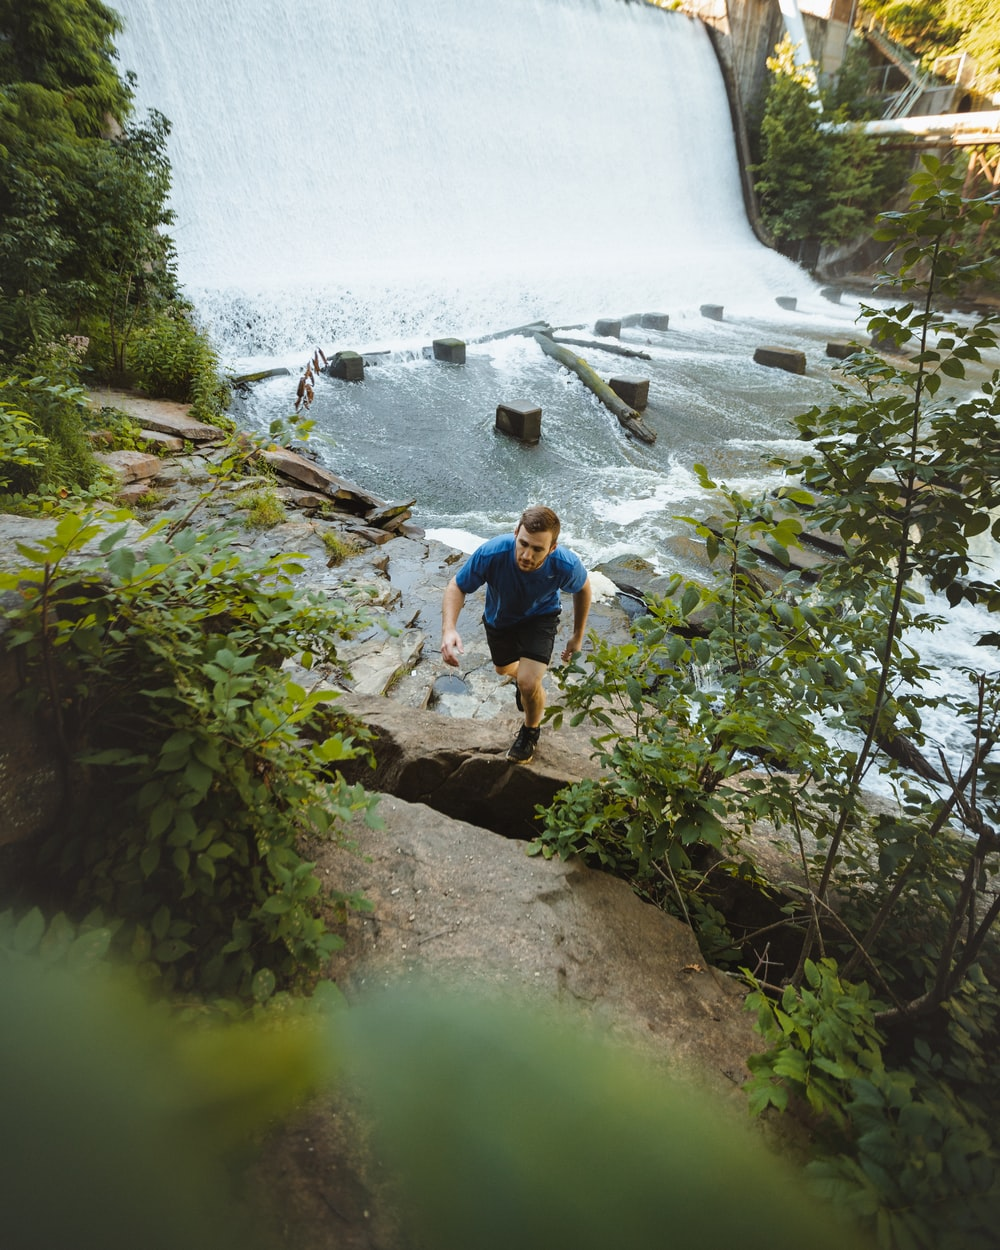 man climbing on cliff beside river